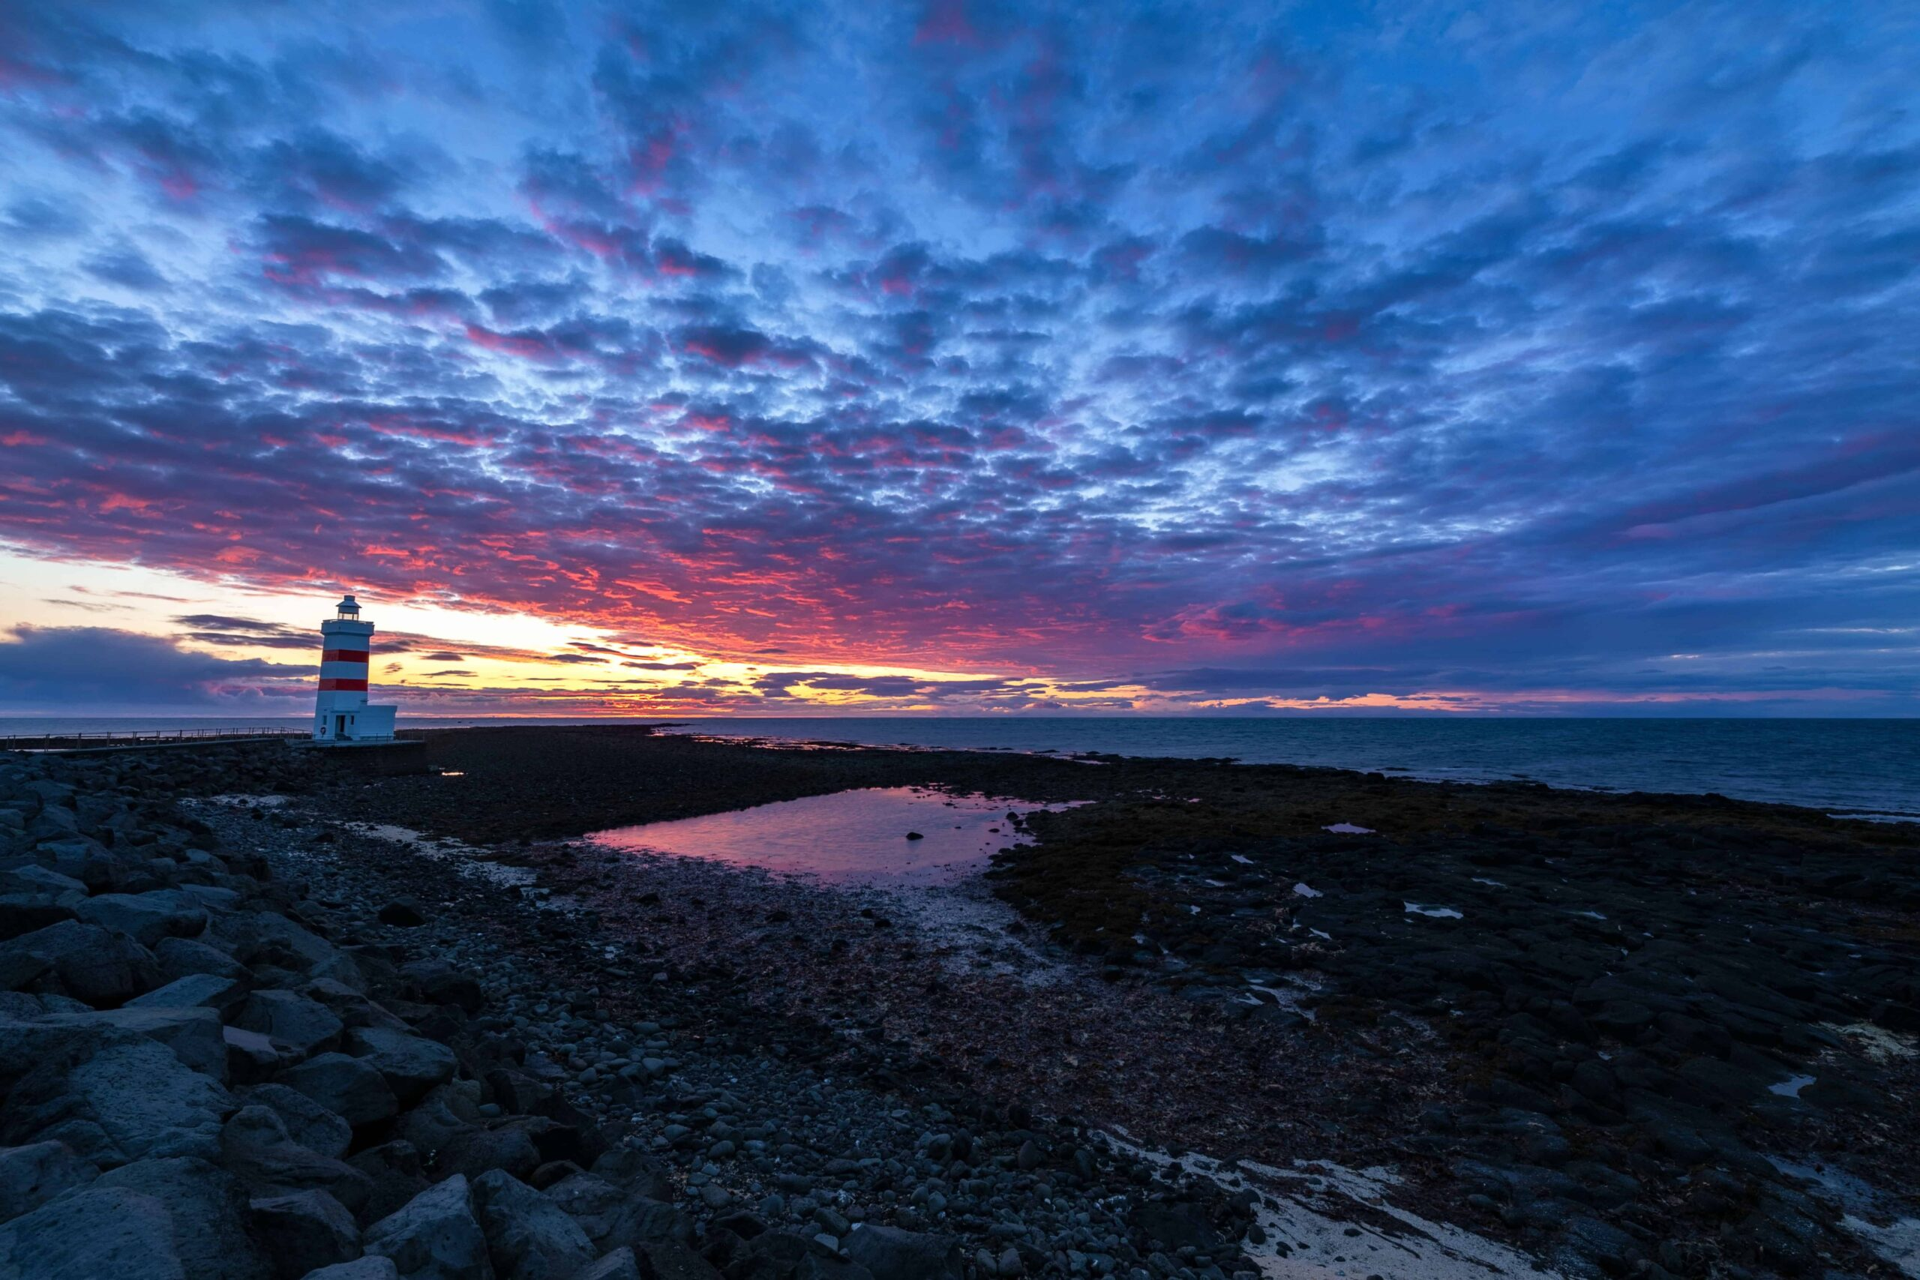 northern lights over Garðskagaviti lighthouse in Reykjanes Peninsula